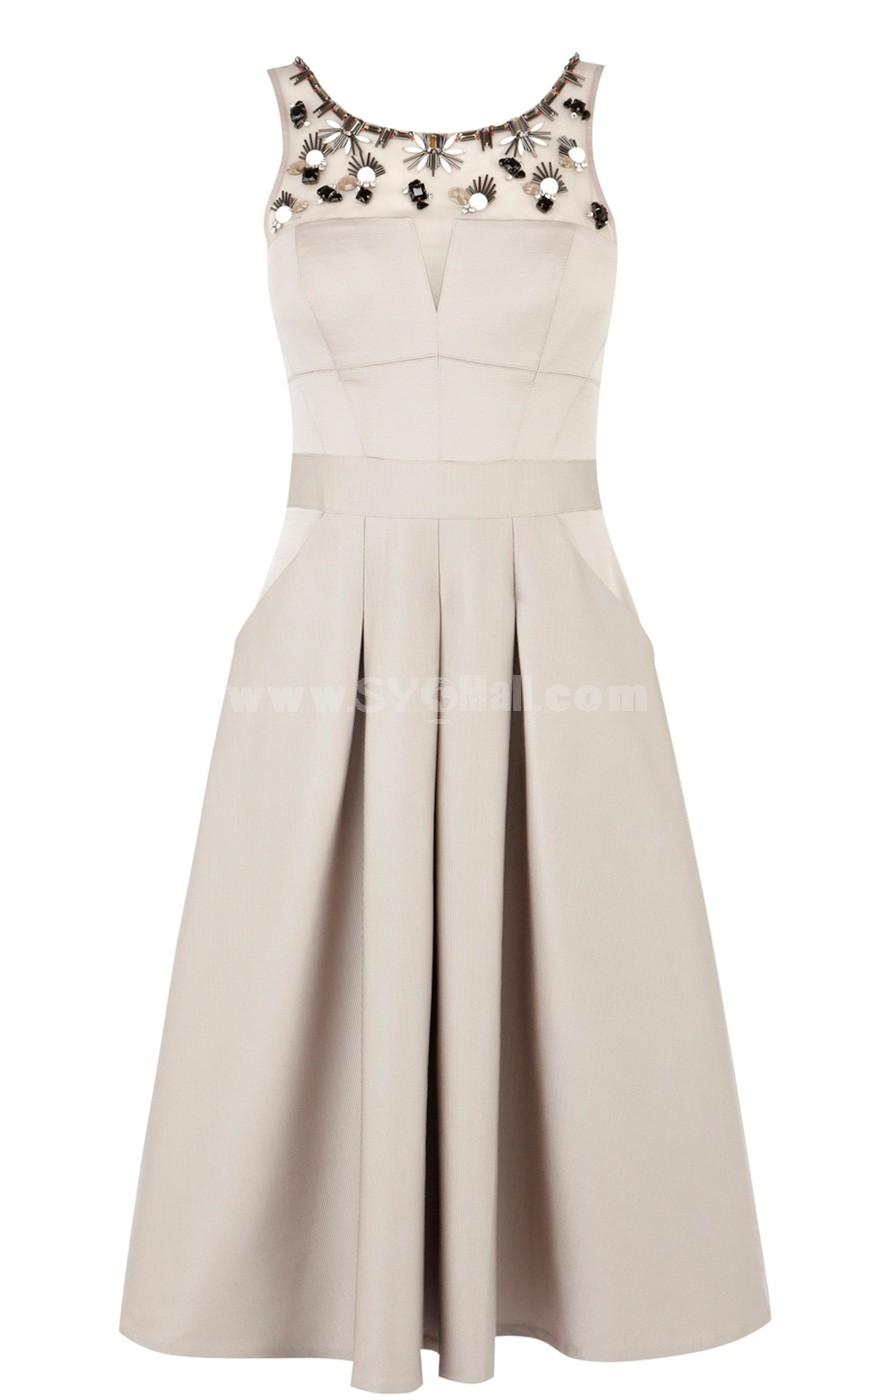 KM Bead Decoration Slim Dress Evening Dress DQ089